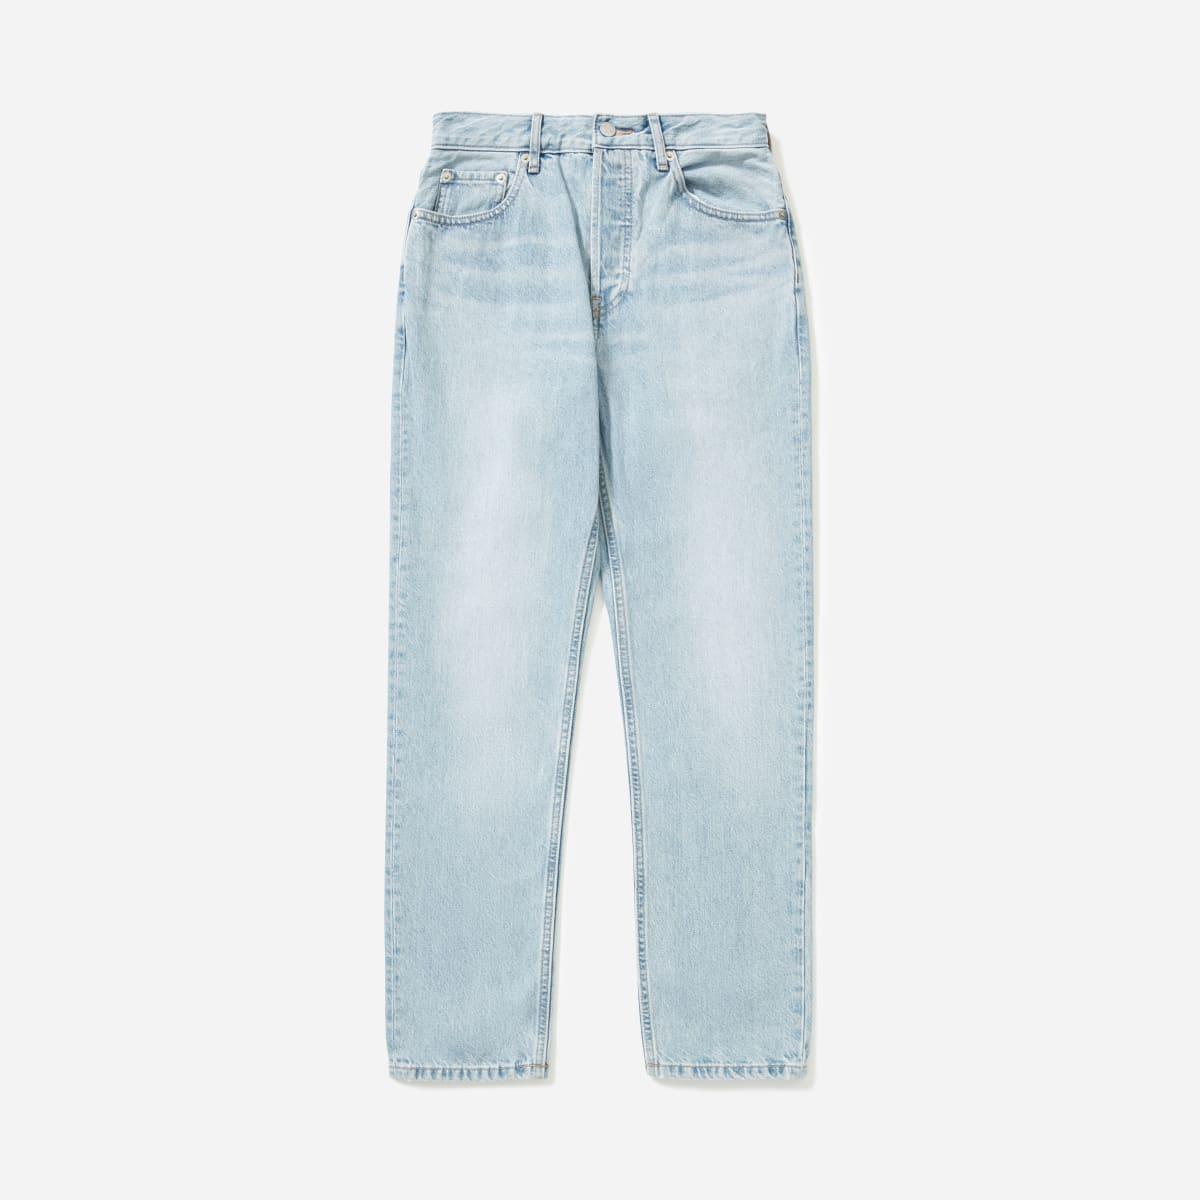 Light wash denim jeans for minimalist french capsule wardrobe